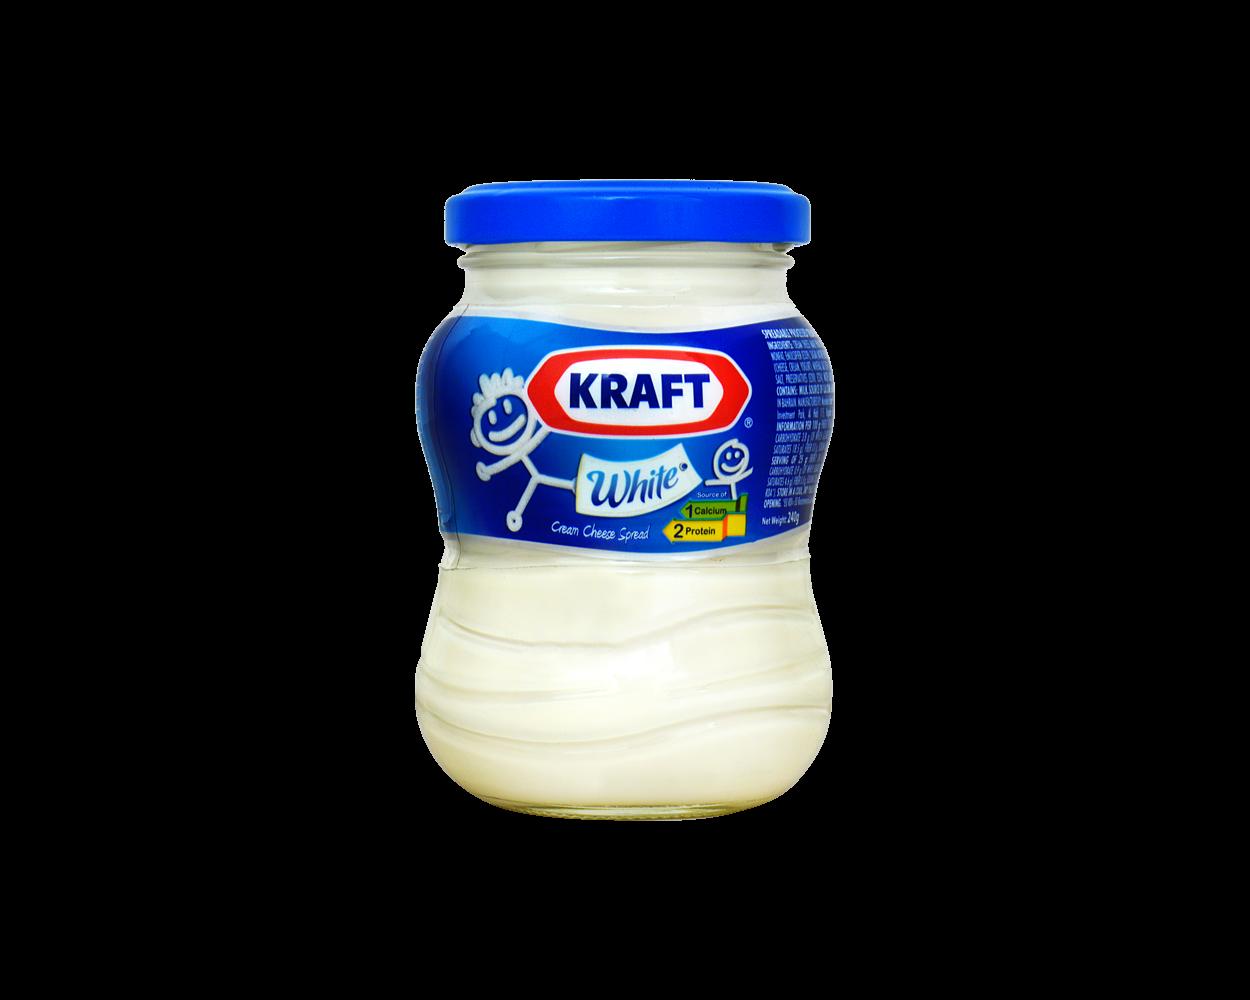 Kraft White Cream Cheese Spread 240g